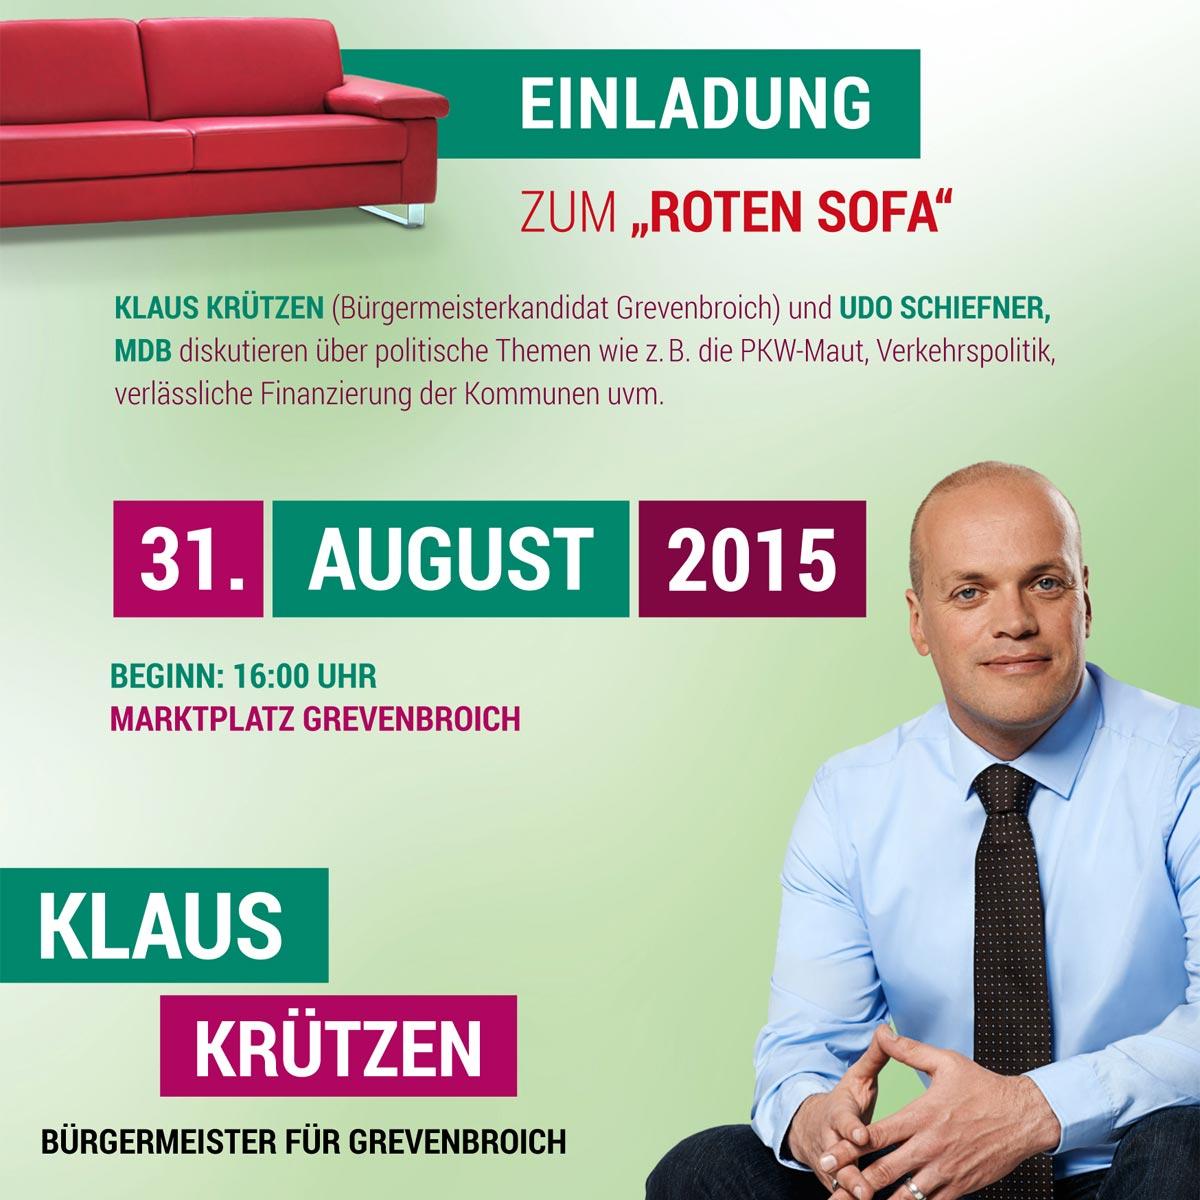 rotes-sofa_kruetzen-schiefner